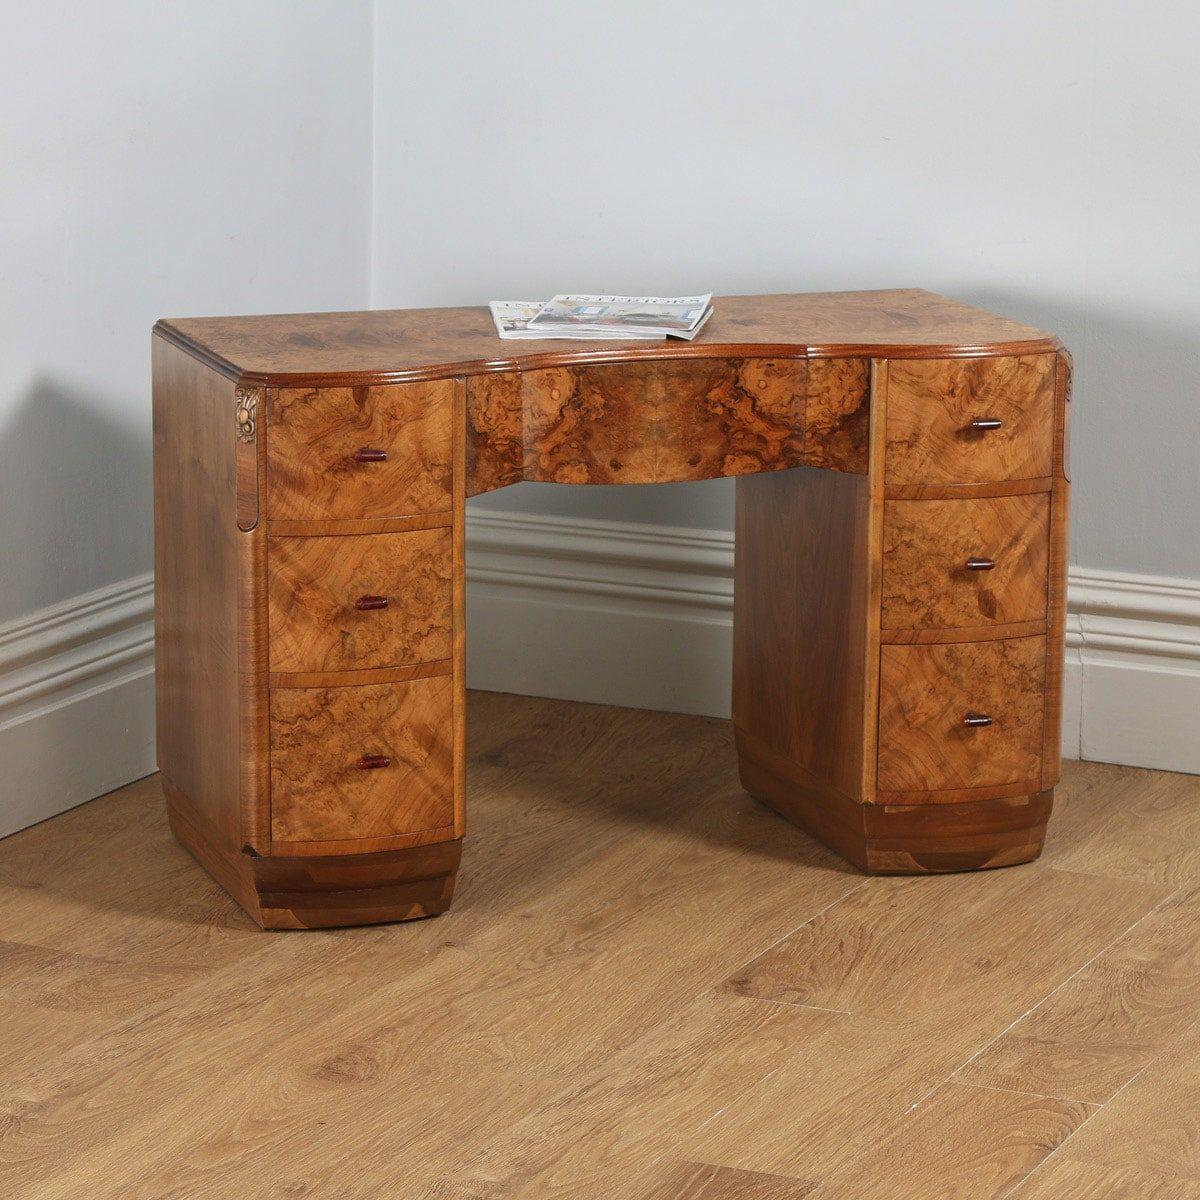 Antique english art deco burr walnut serpentine office desk circa 1930